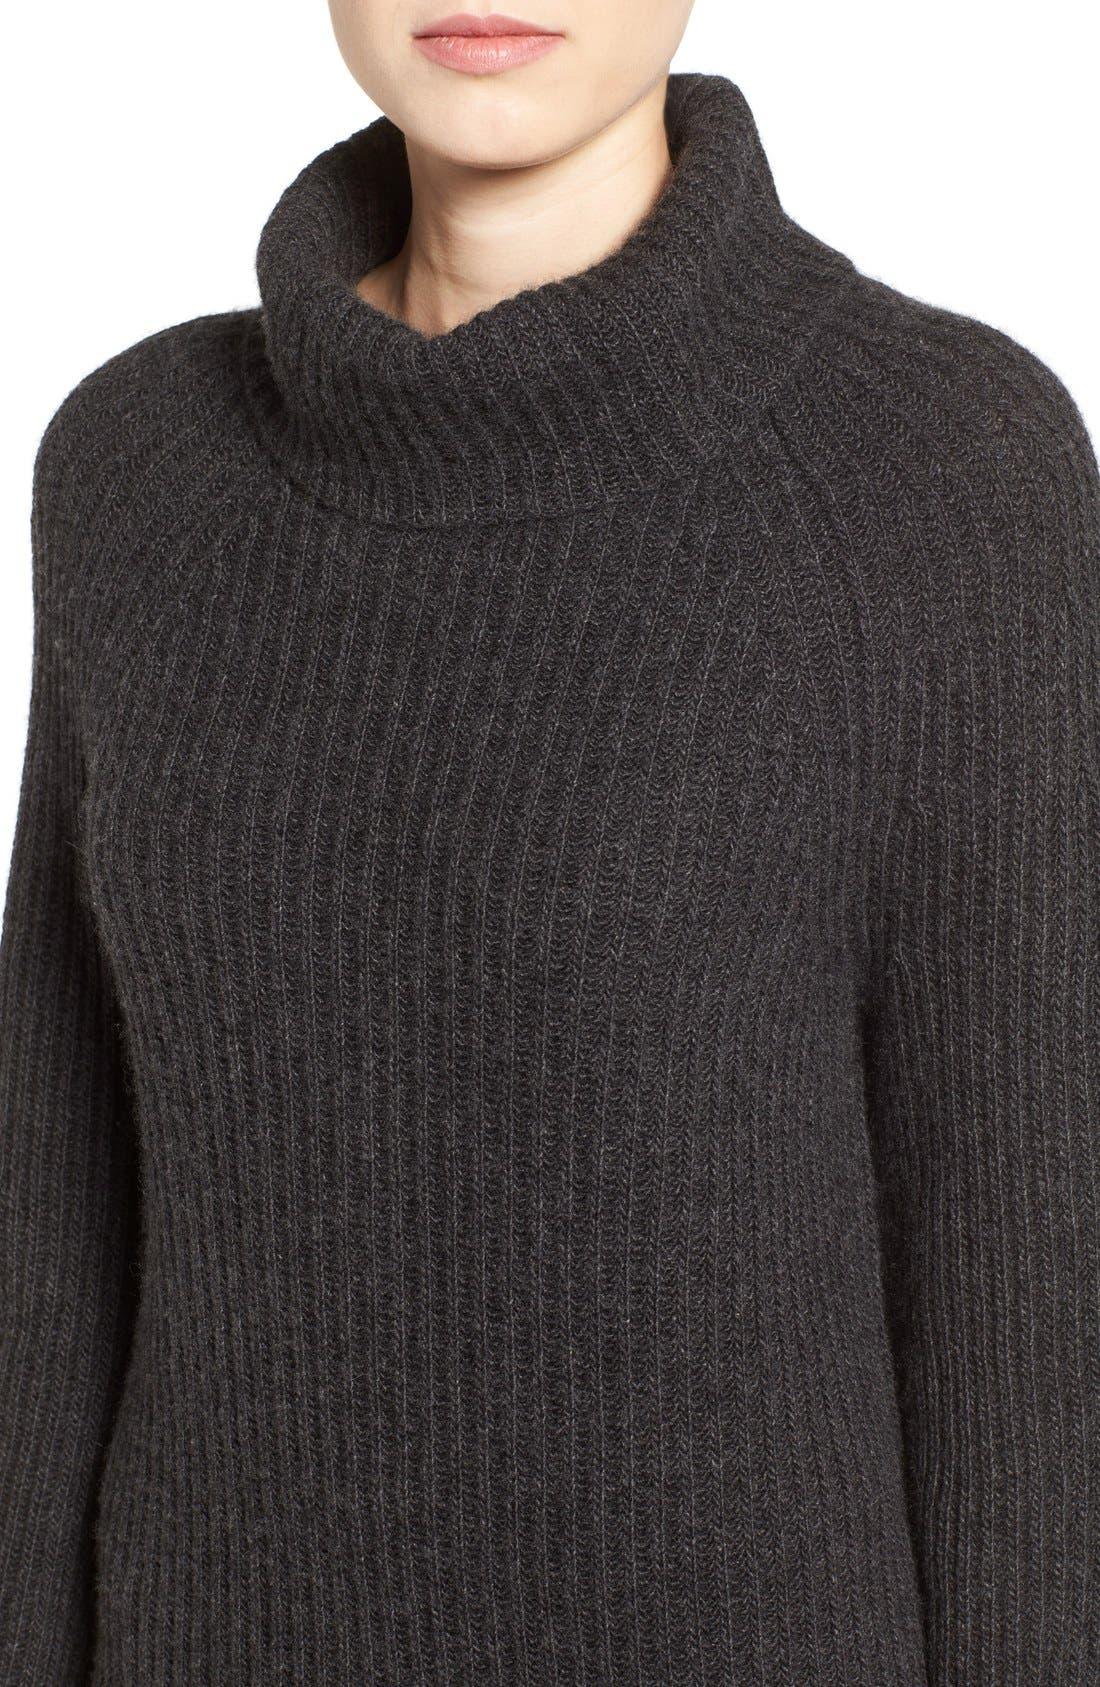 Ribbed Cashmere Turtleneck Sweater,                             Alternate thumbnail 3, color,                             021